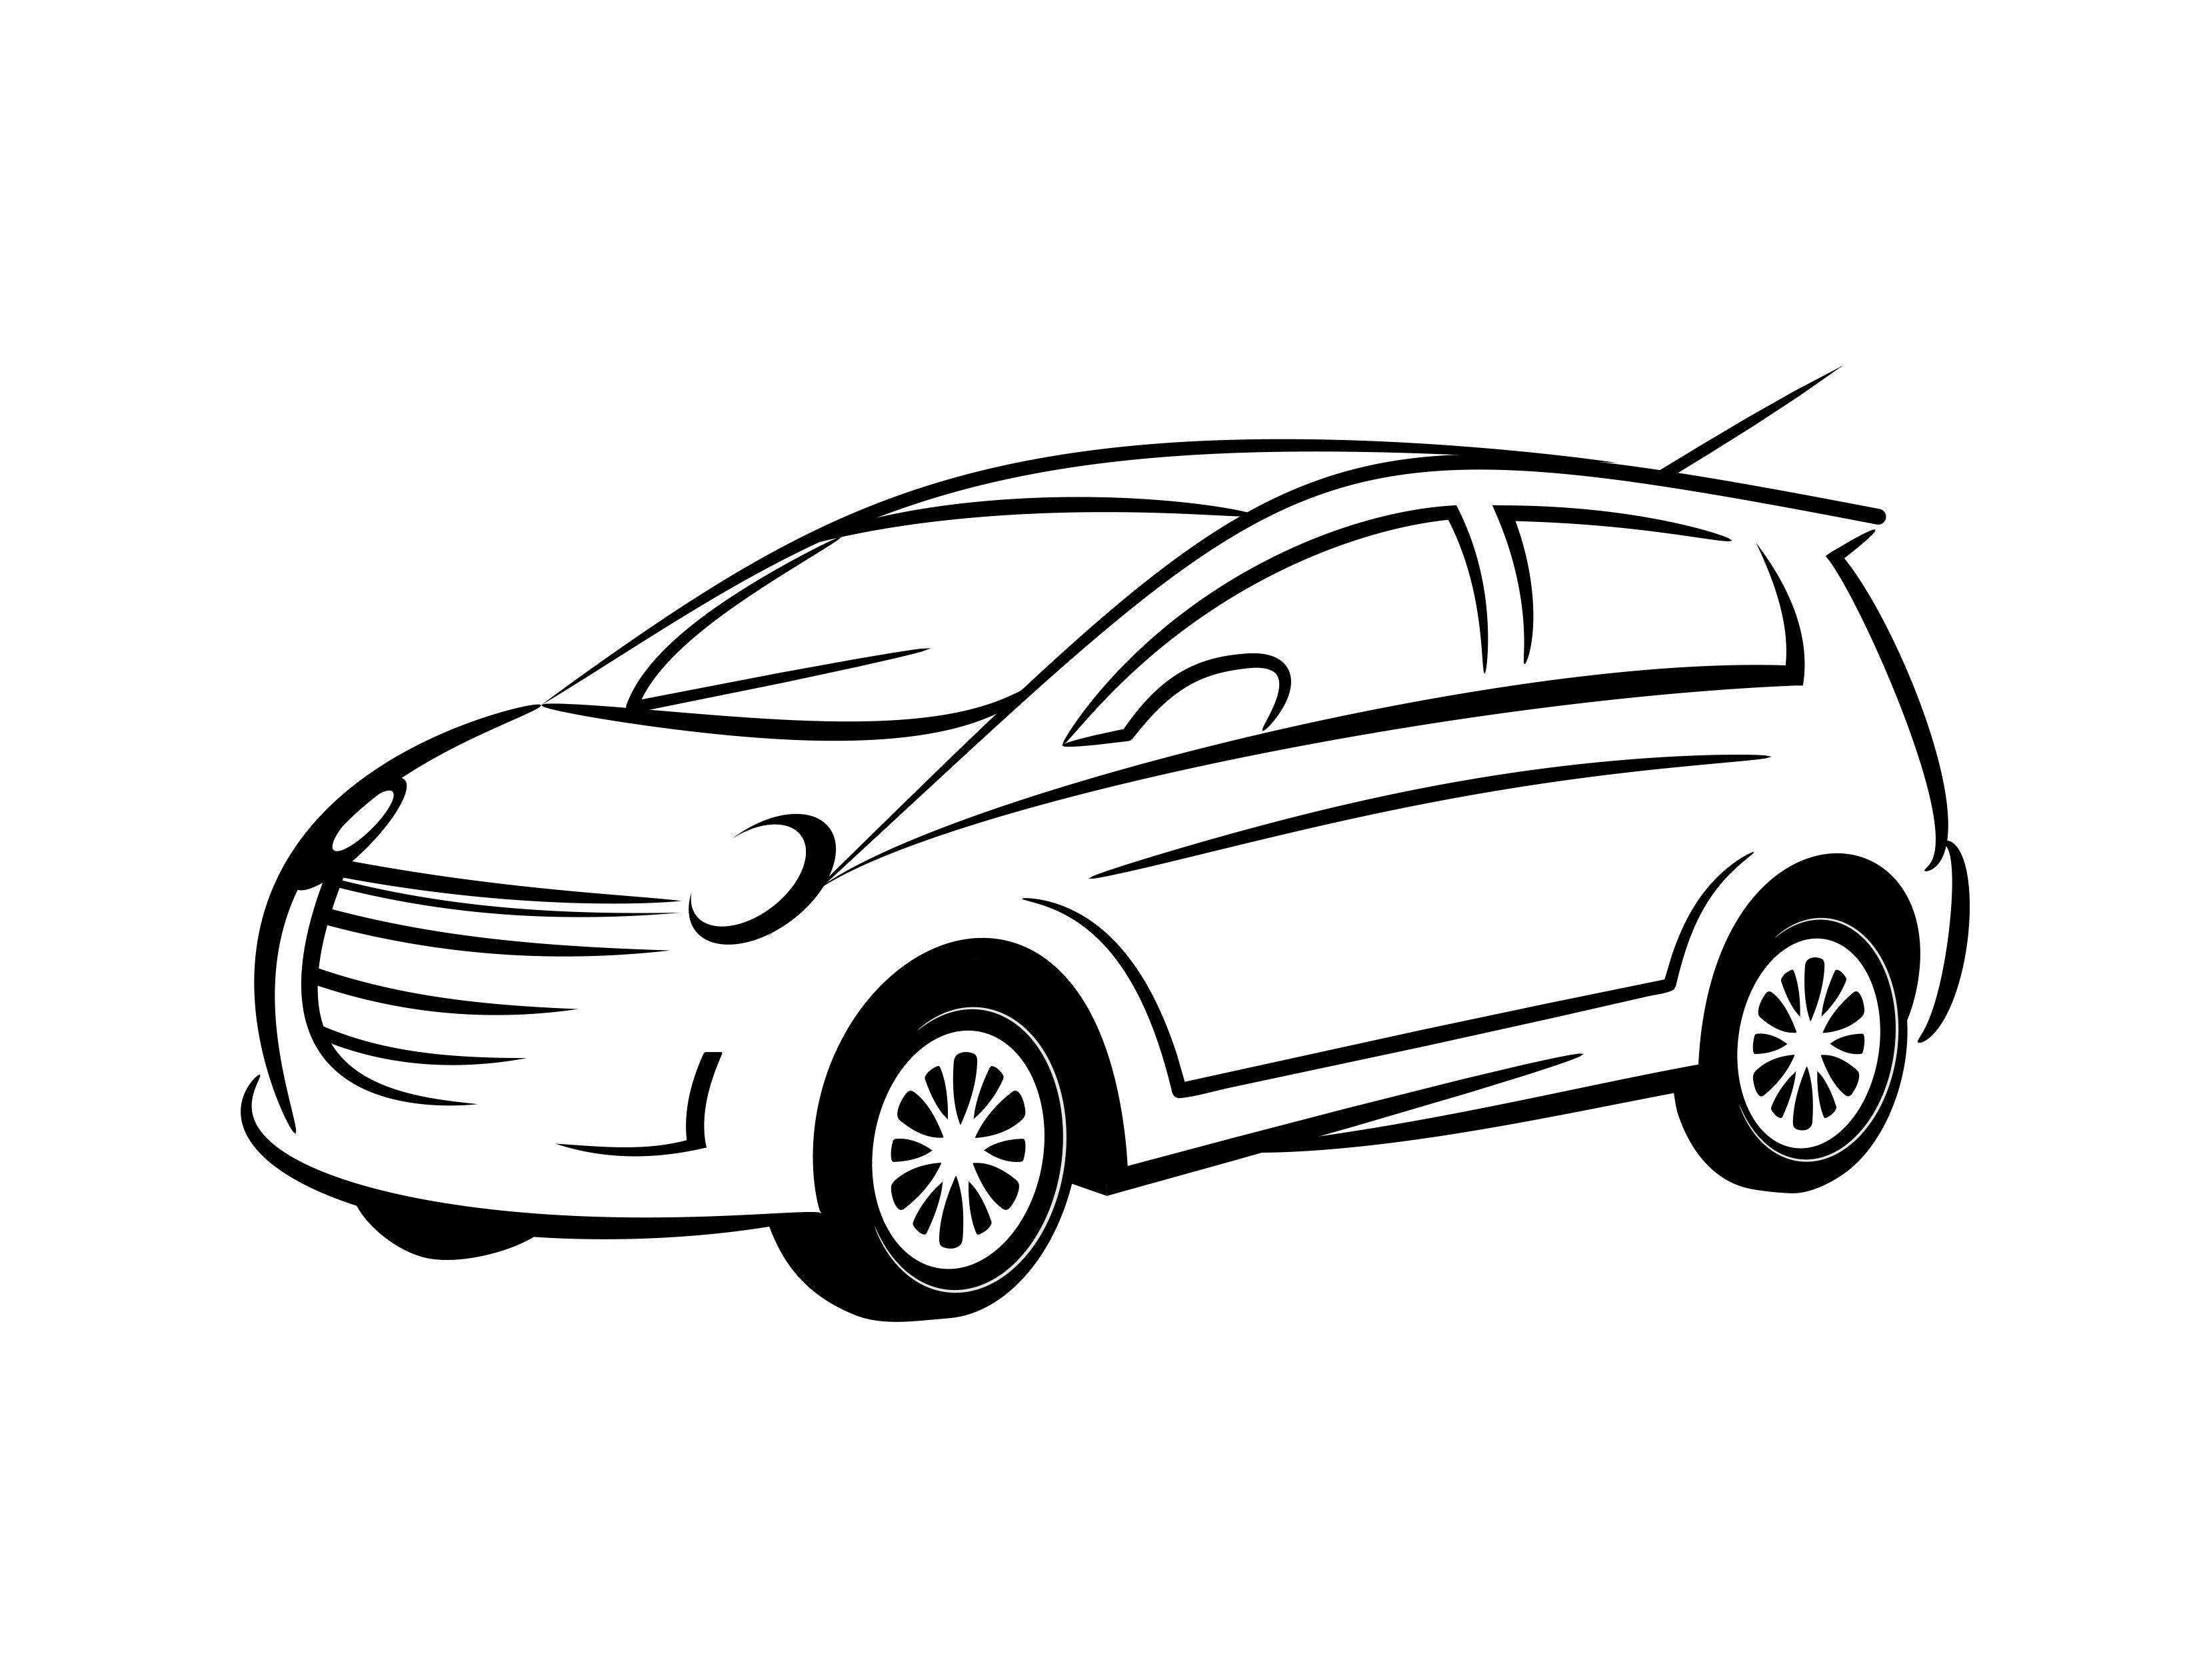 vw gti sport wiring diagram database VW GTI Convertible best hot hatches less than 1k trafalgar street car park vw gti 2014 4 door the